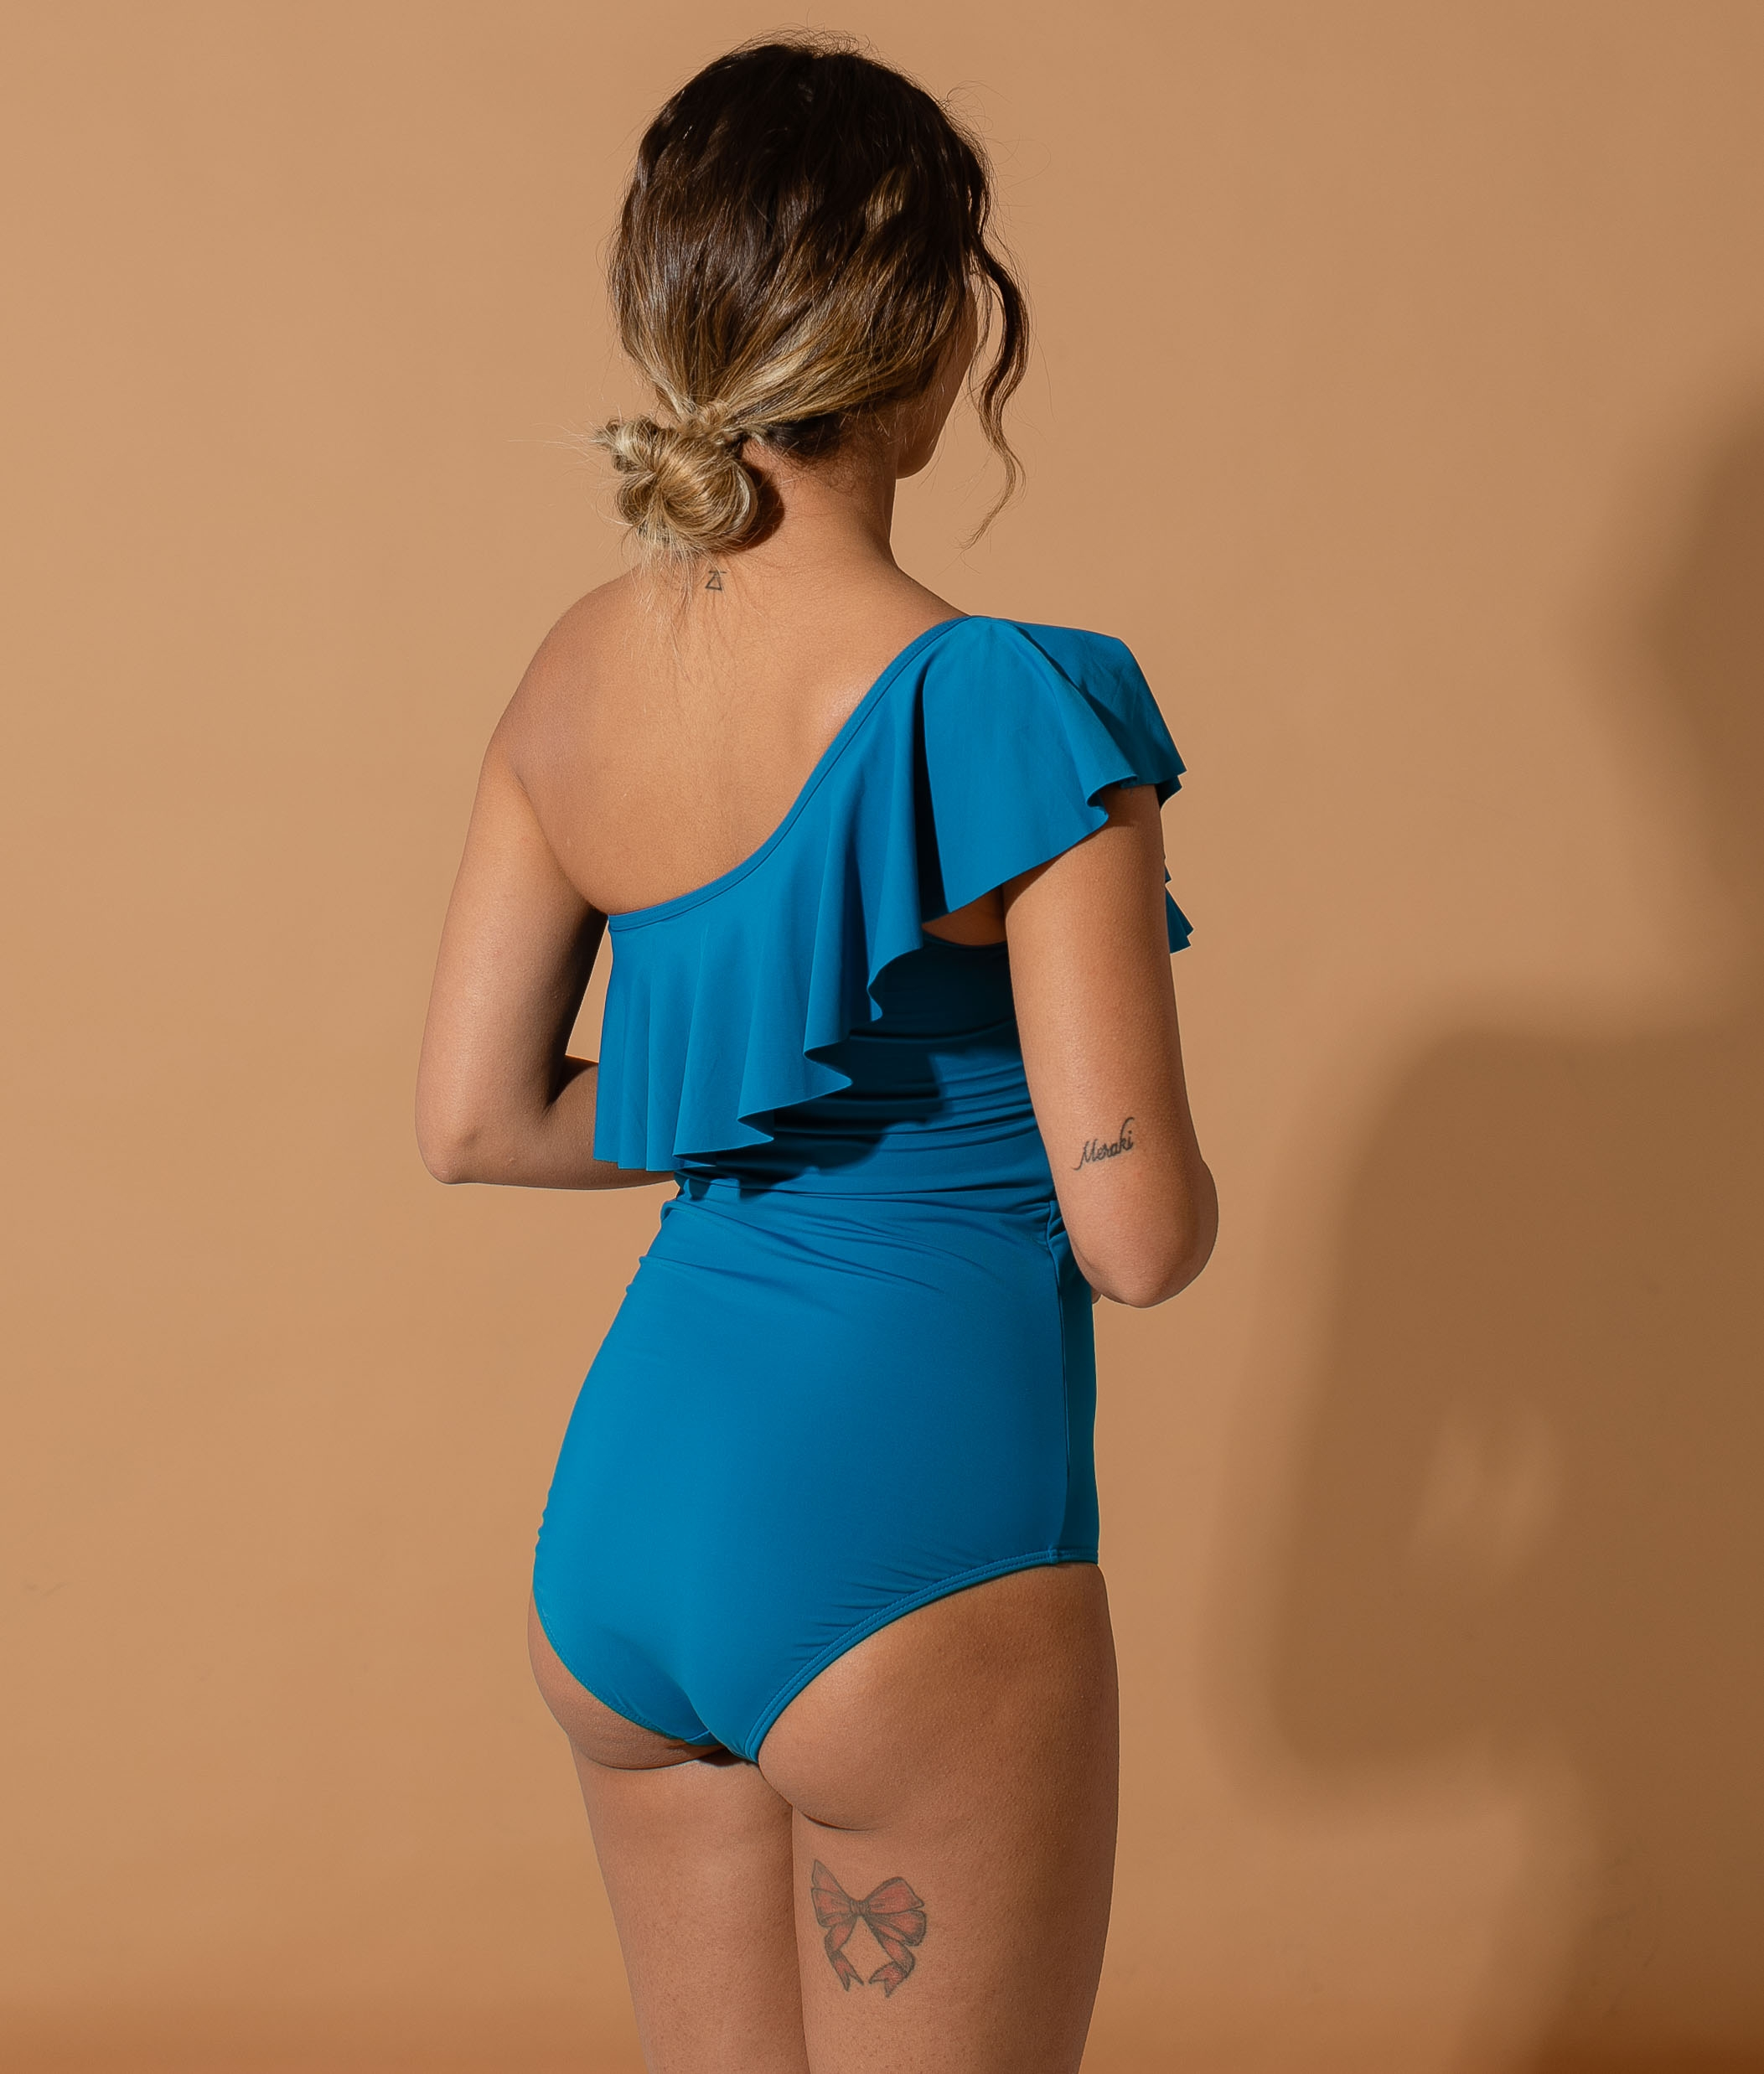 SWIMSUIT DAGARBE - BLUE